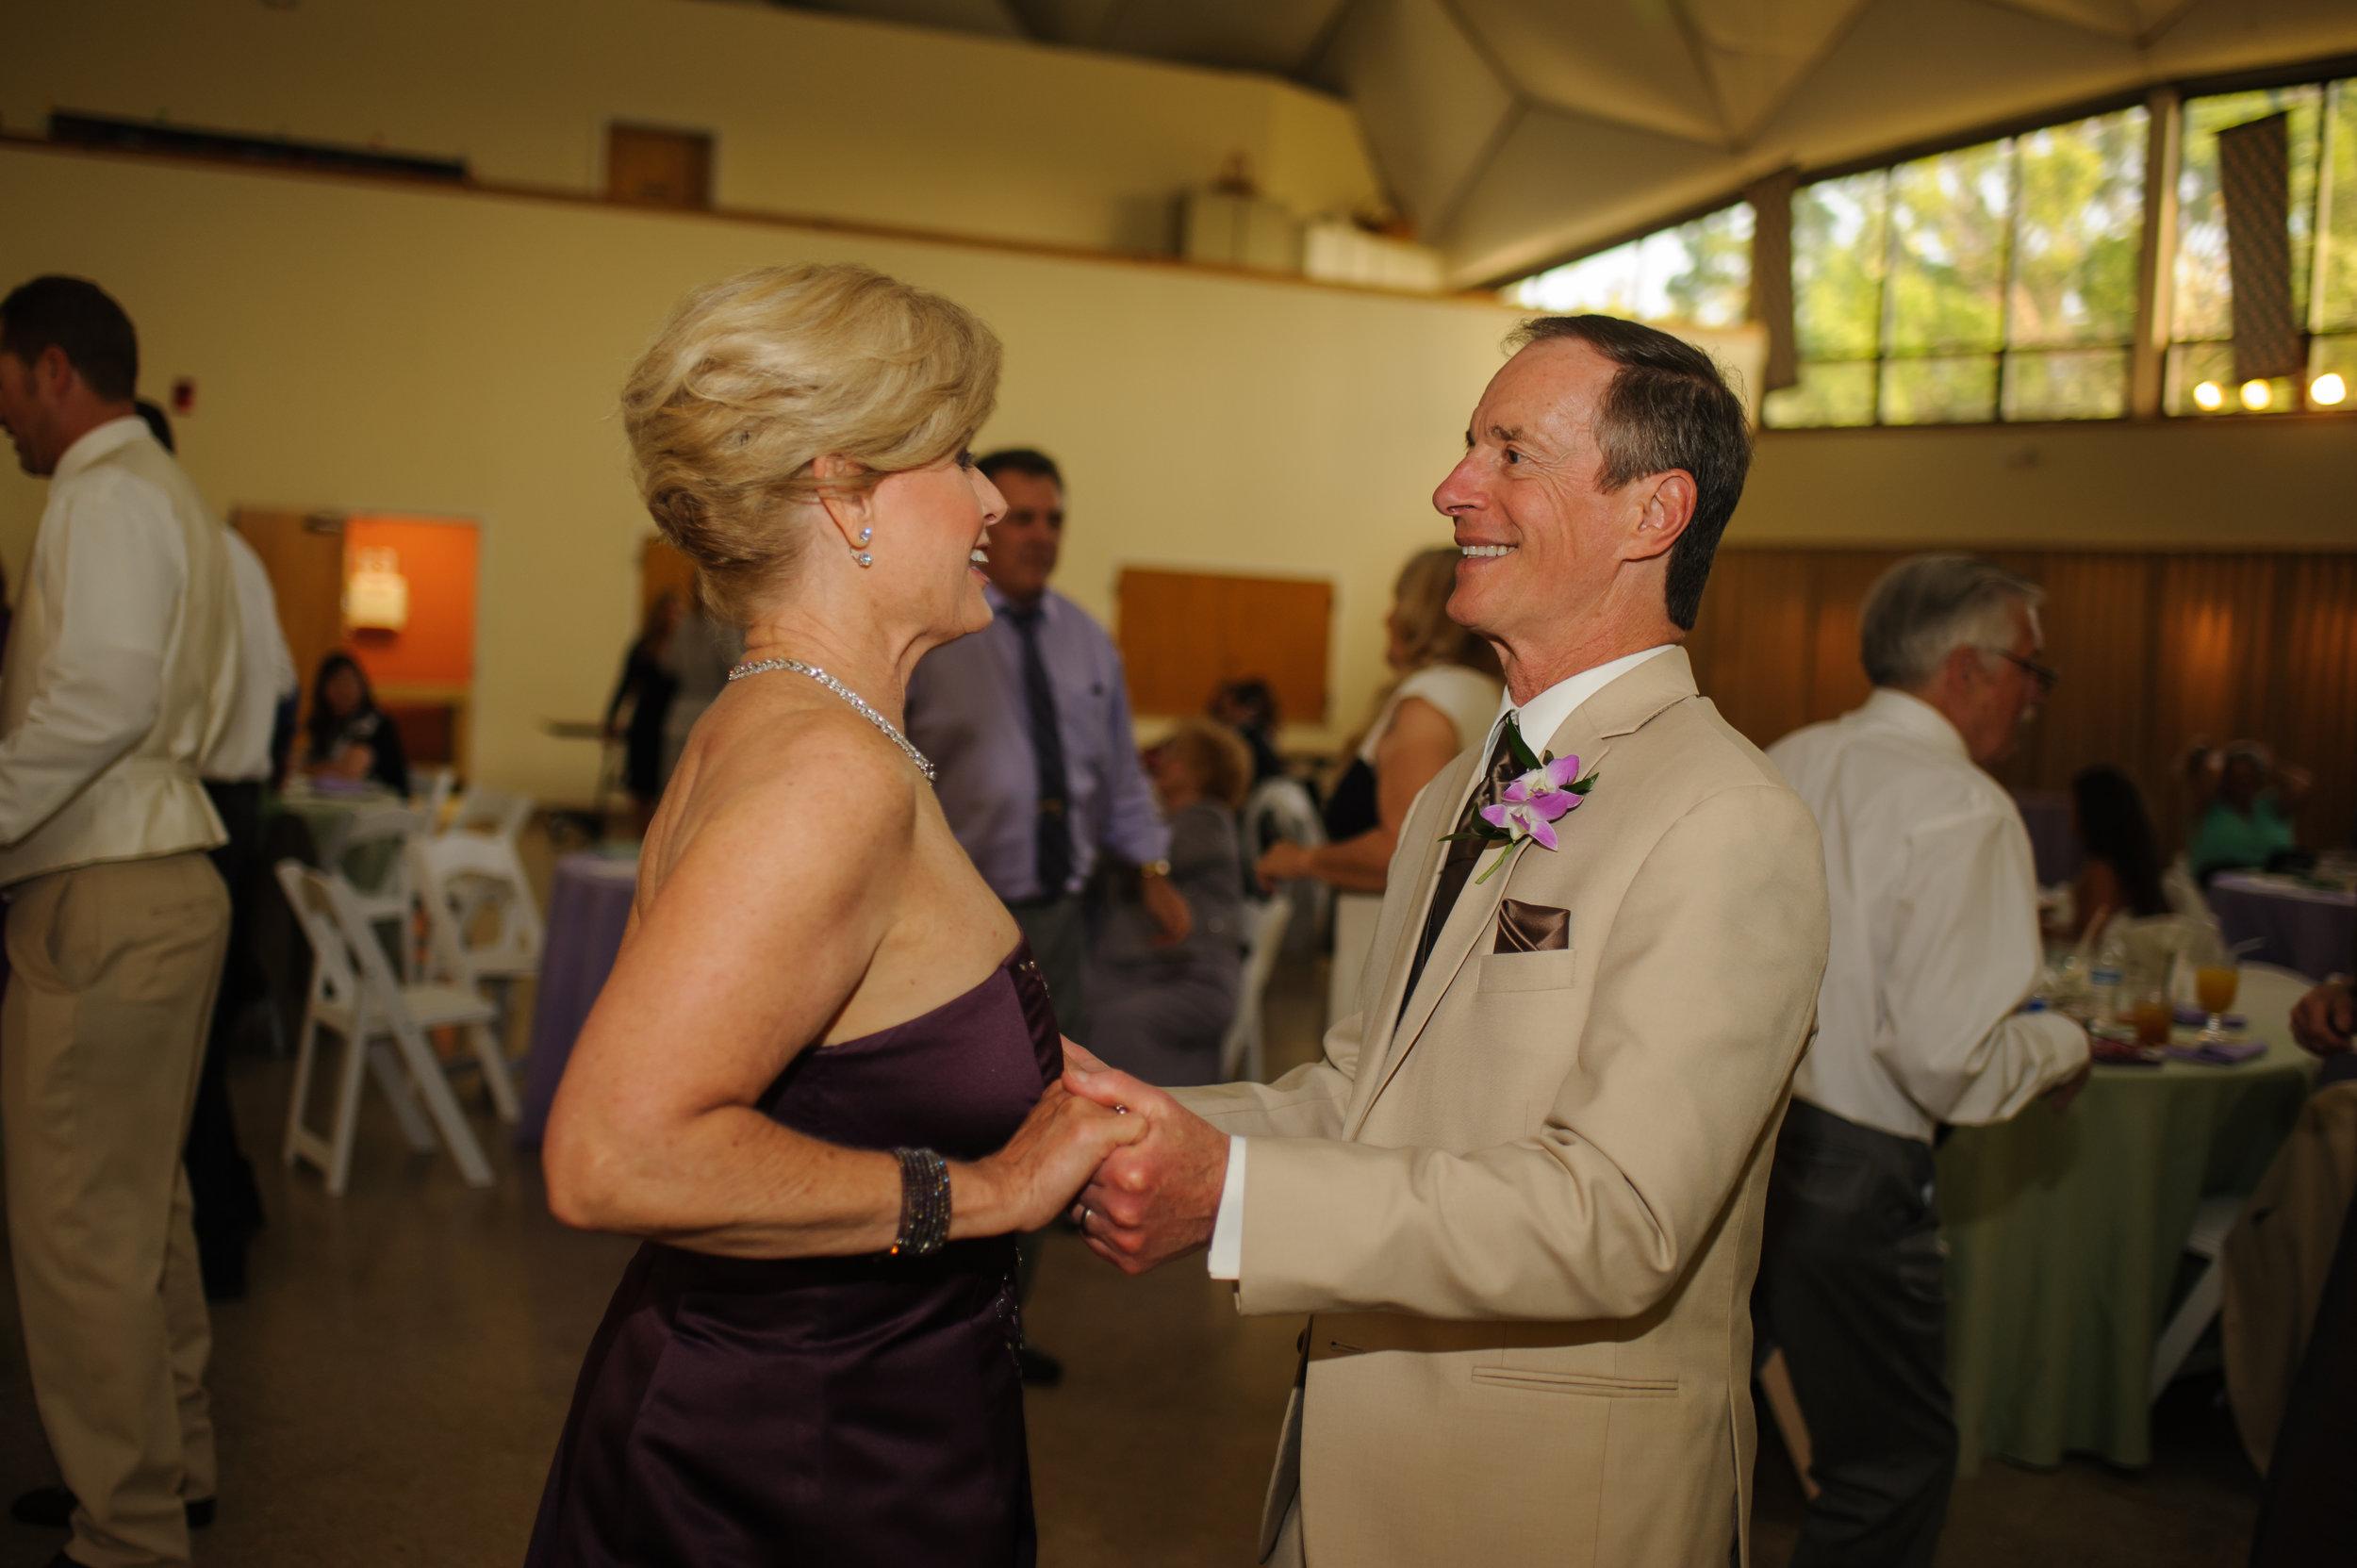 danielle-ross-038-sacramento-wedding-photographer-katherine-nicole-photography.JPG